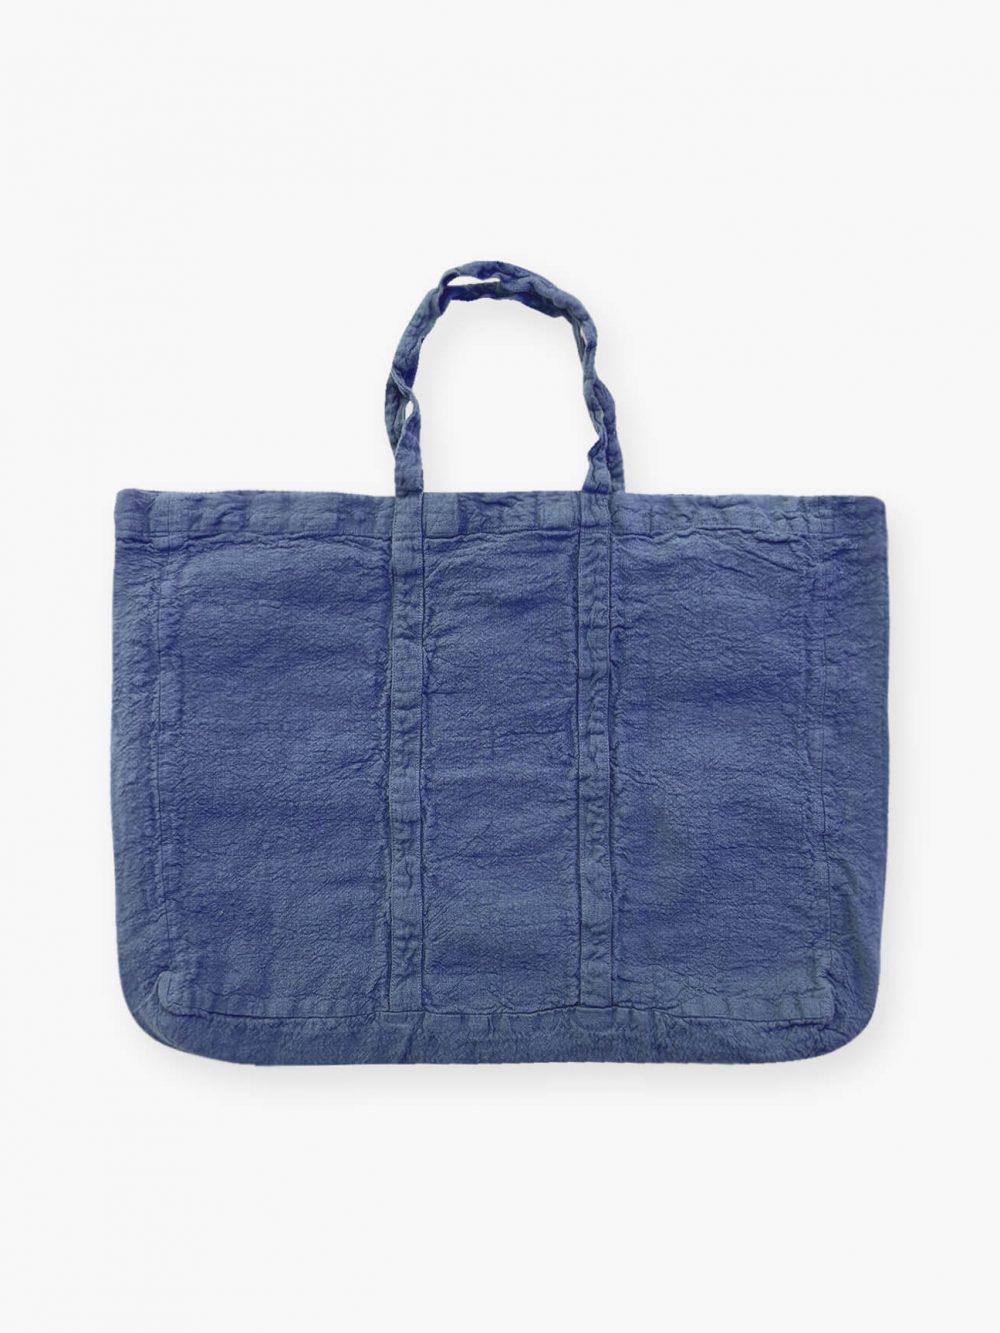 Sac de plage vegan bleu outremer en lin français de la marque comptoir des teintures Made in France